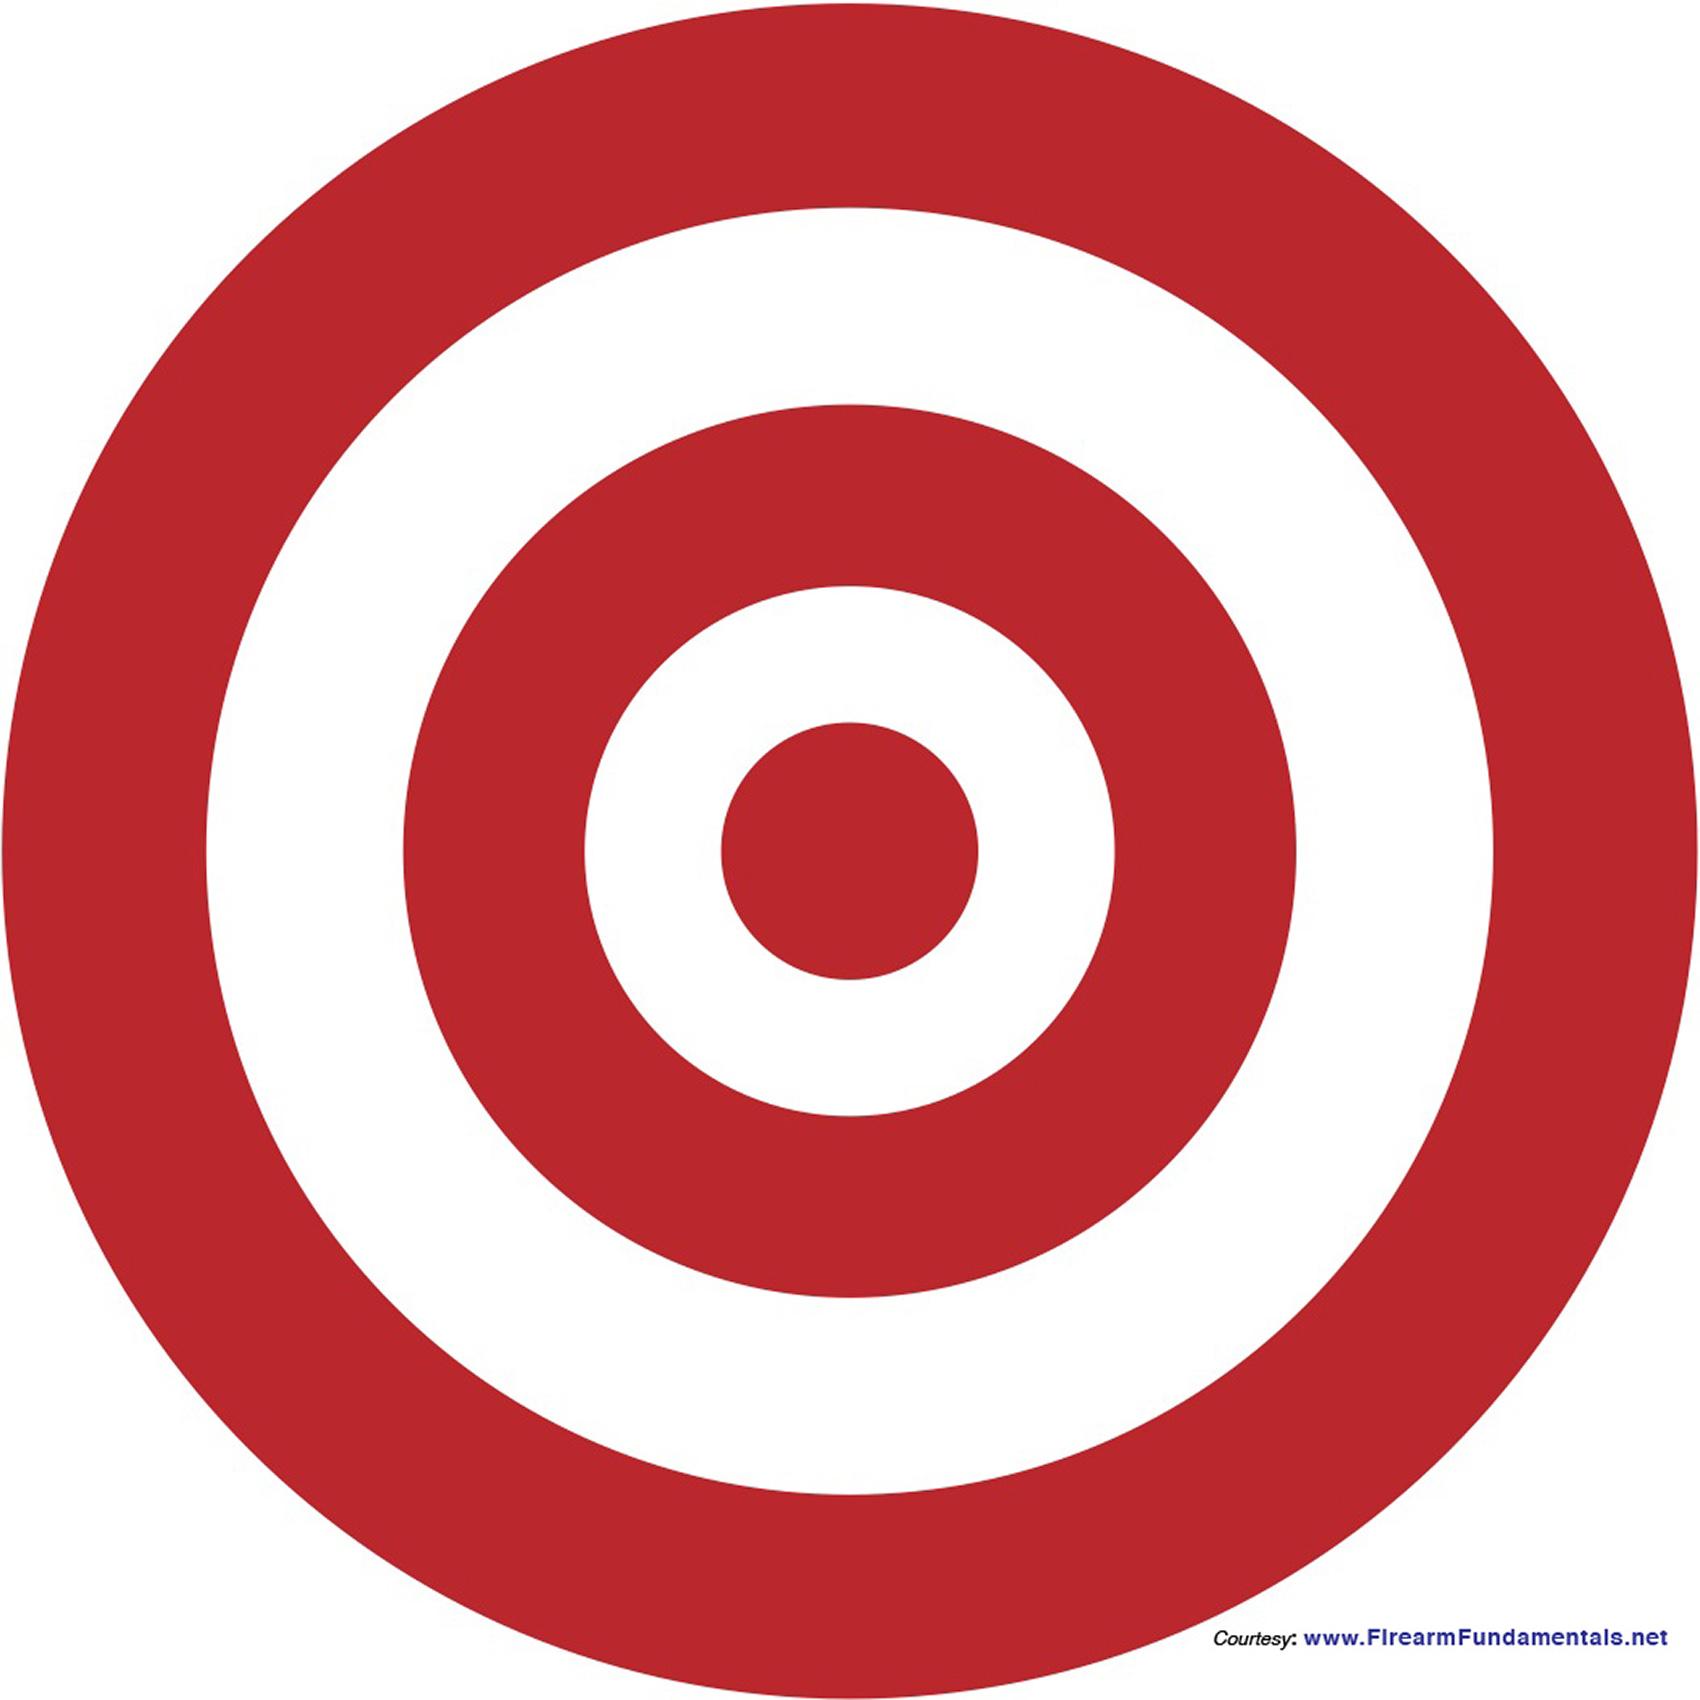 25 Bullseye Images Free Cliparts That Yo-25 Bullseye Images Free Cliparts That You Can Download To You Computer-8